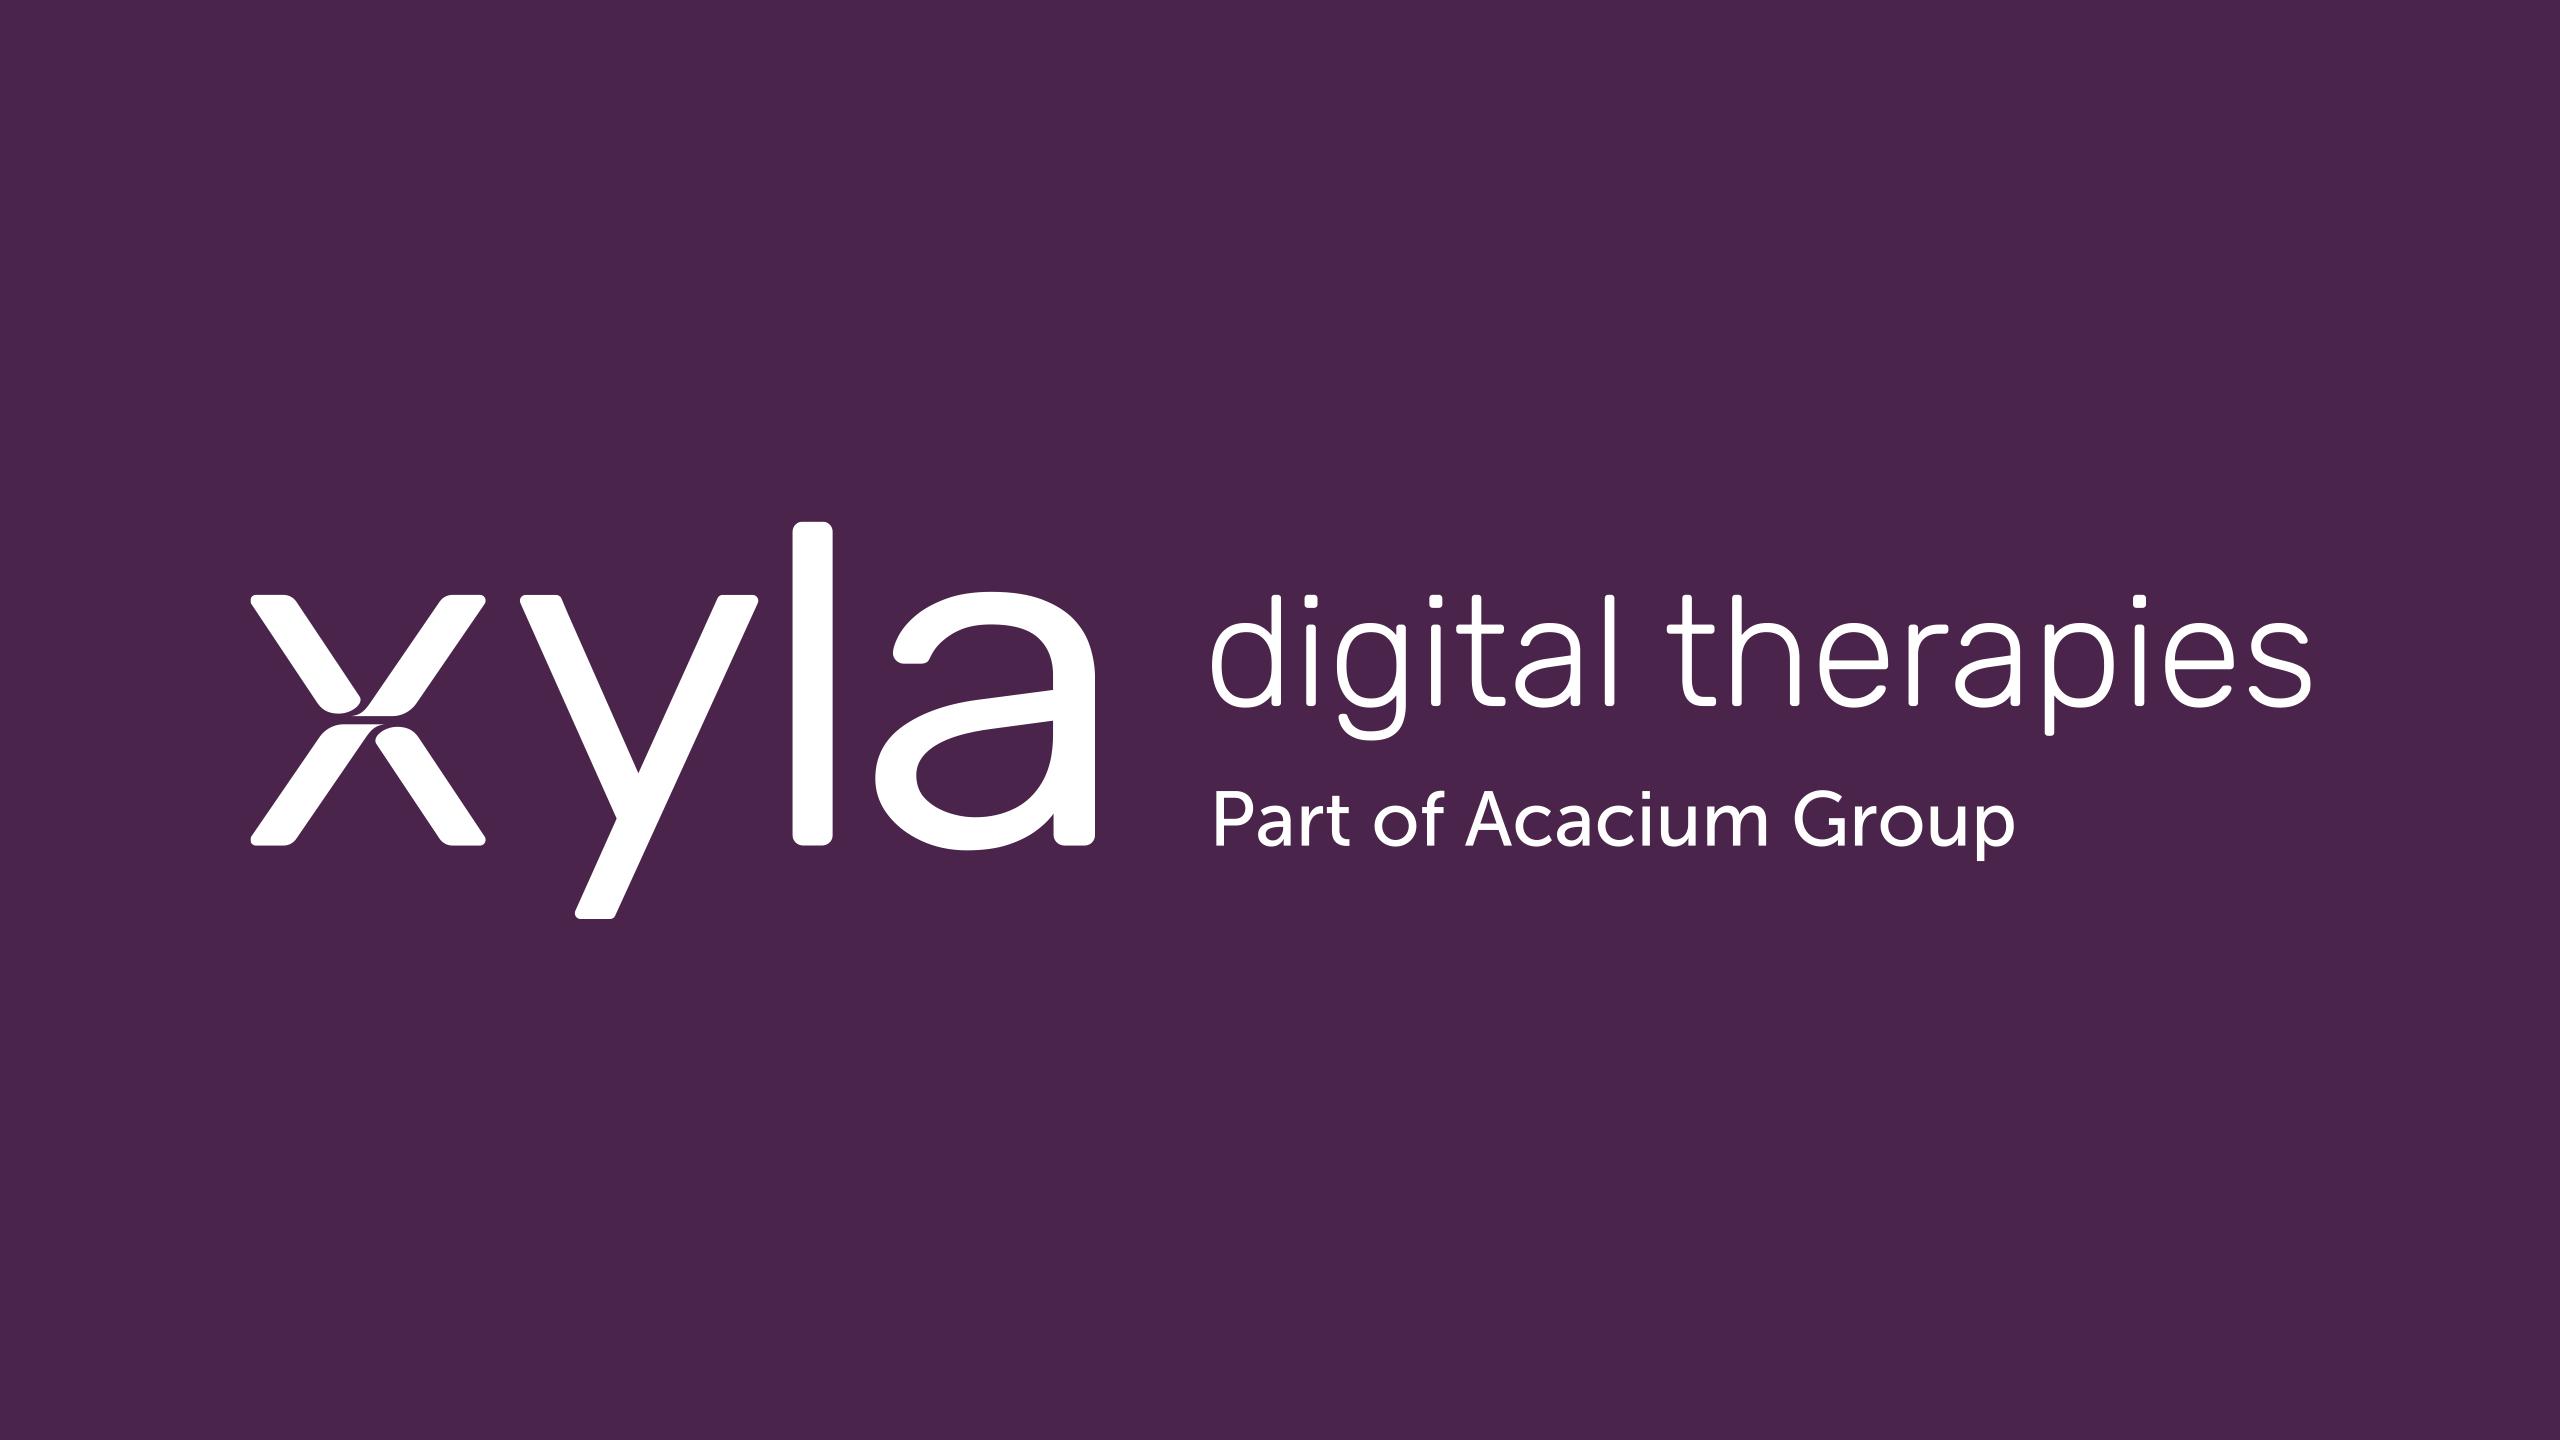 Xyla Digital Therapies